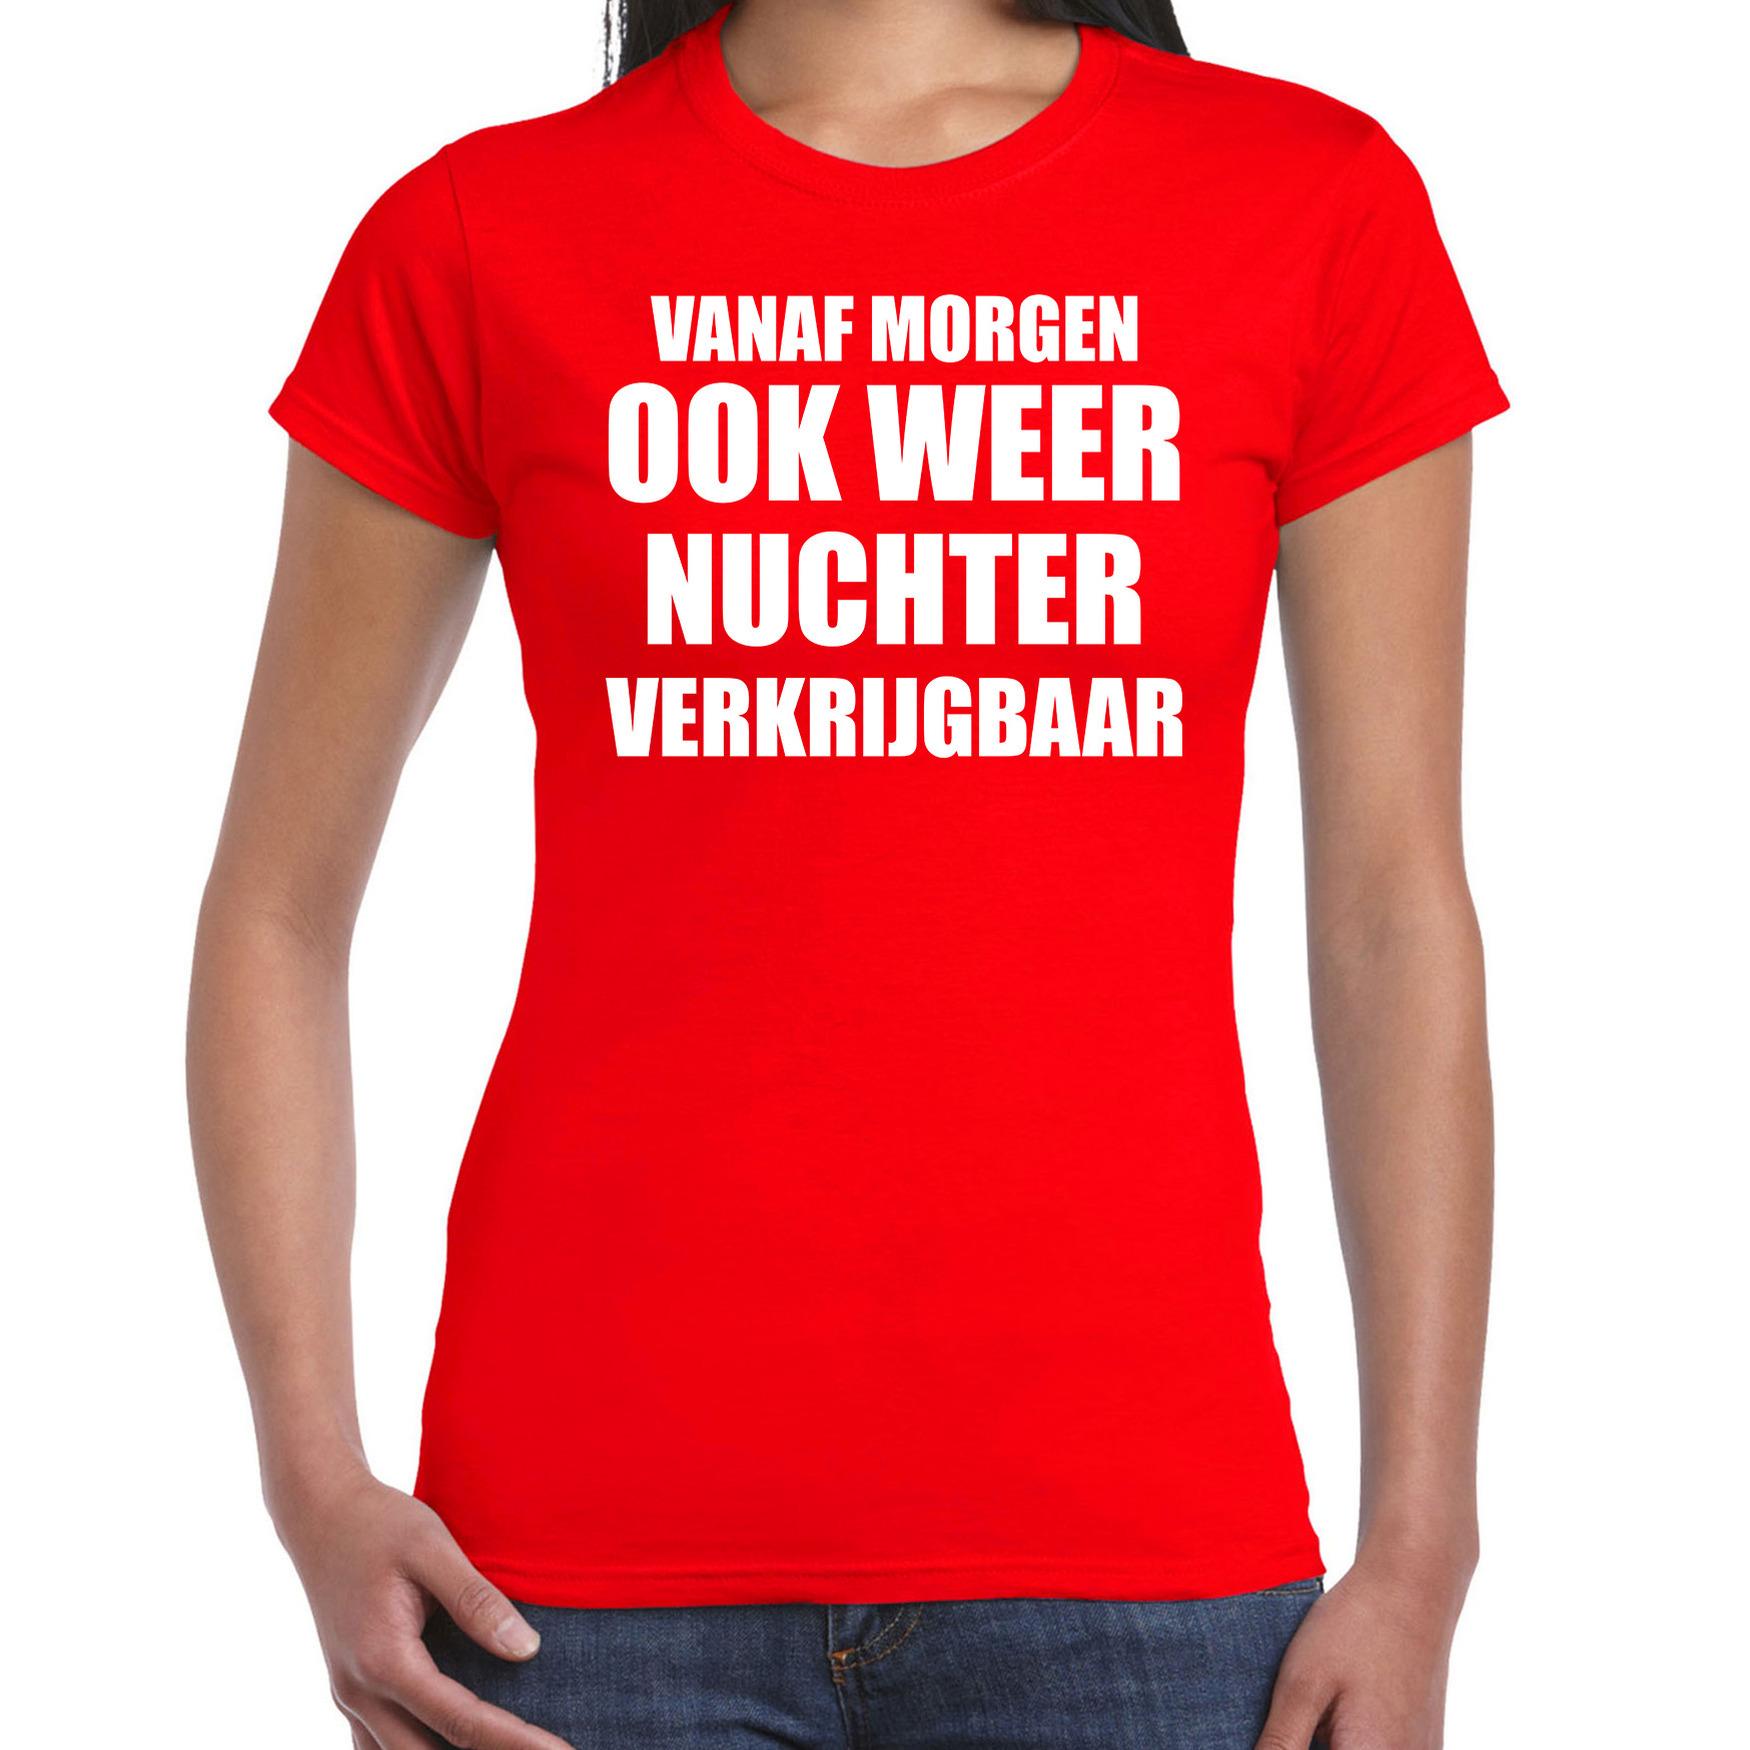 Feest t-shirt morgen nuchter verkrijgbaar rood voor dames L -